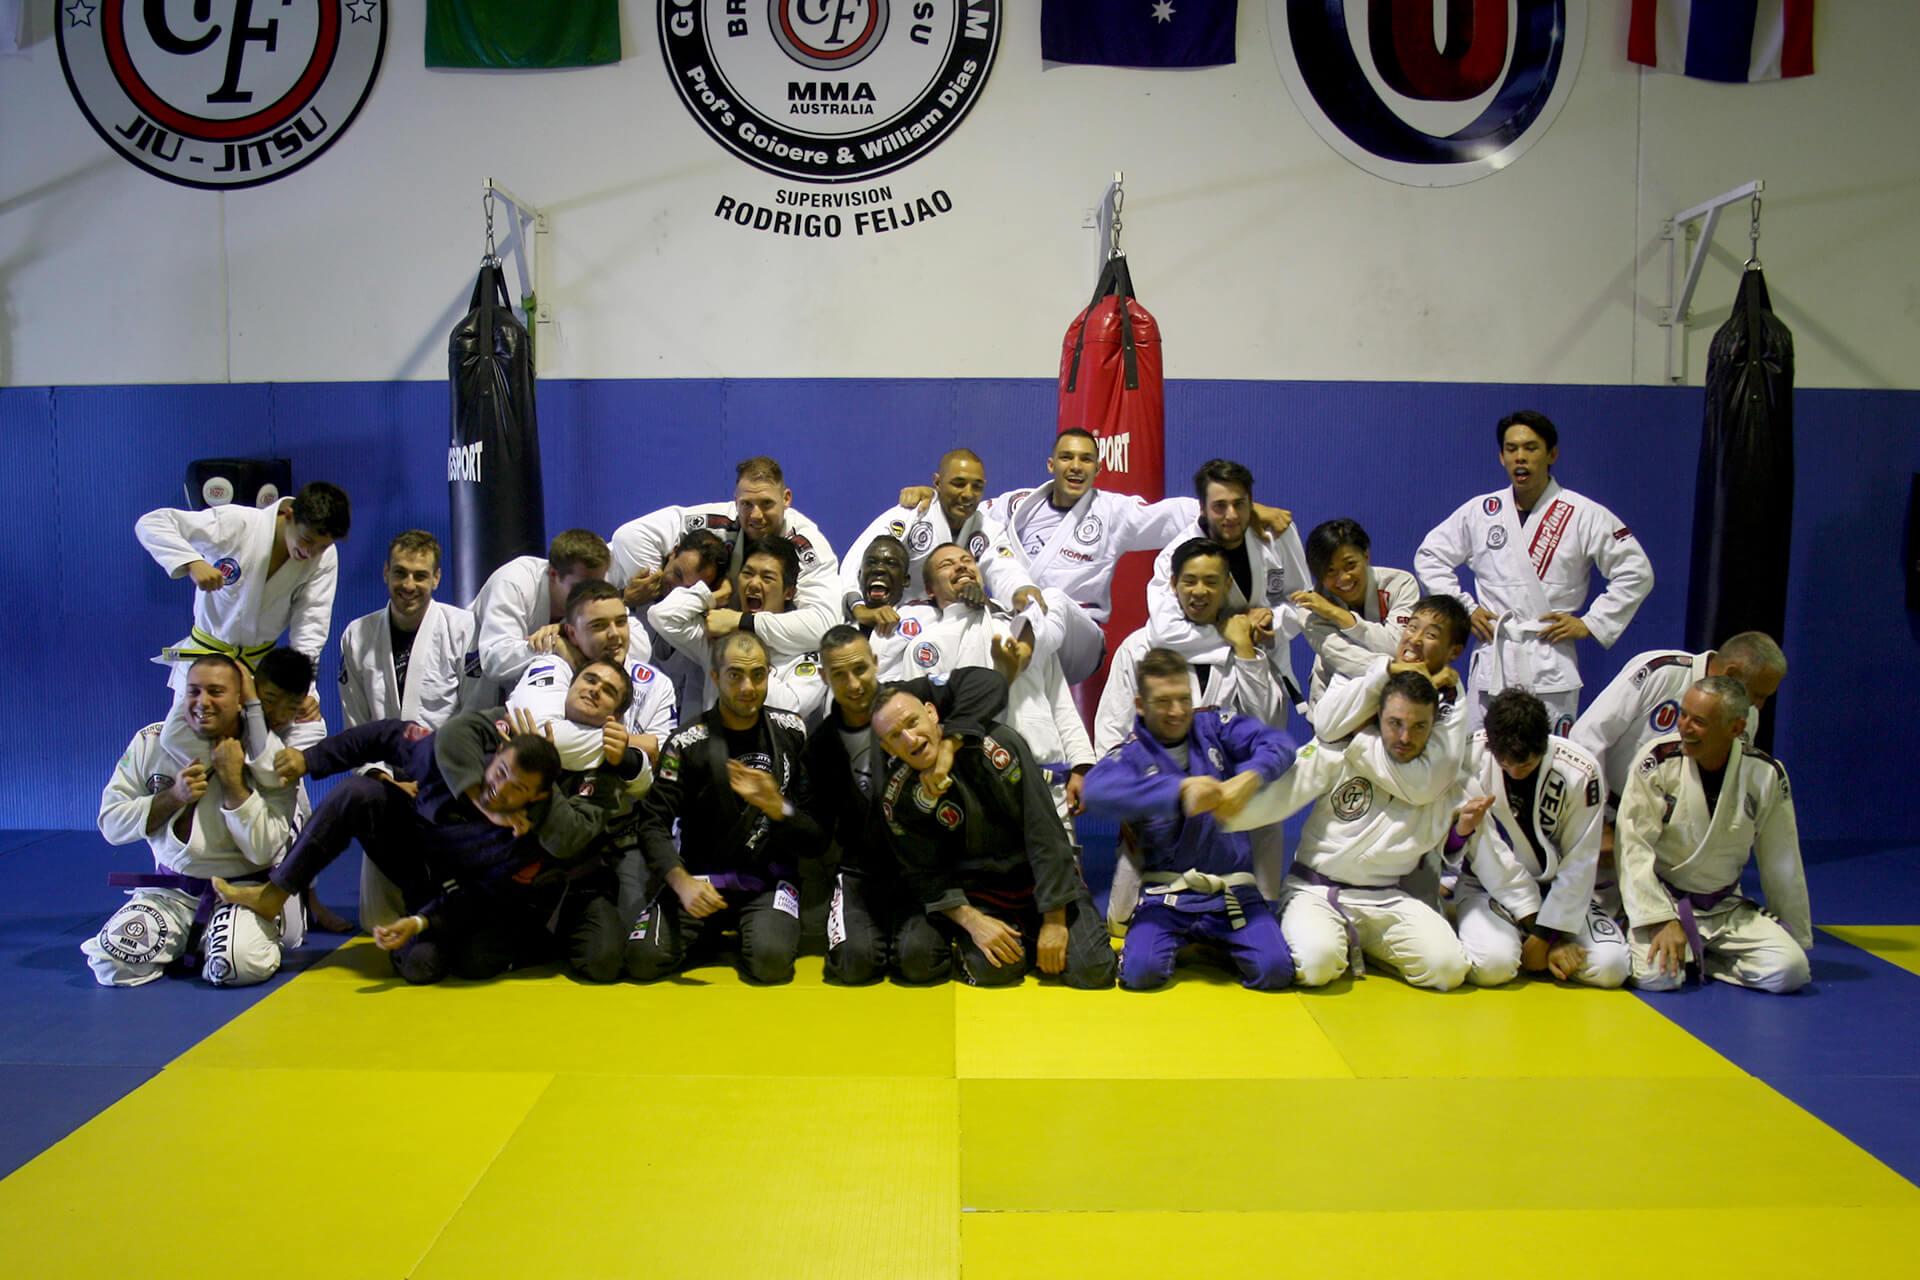 BJJ Archives - Perth Martial Arts Centre